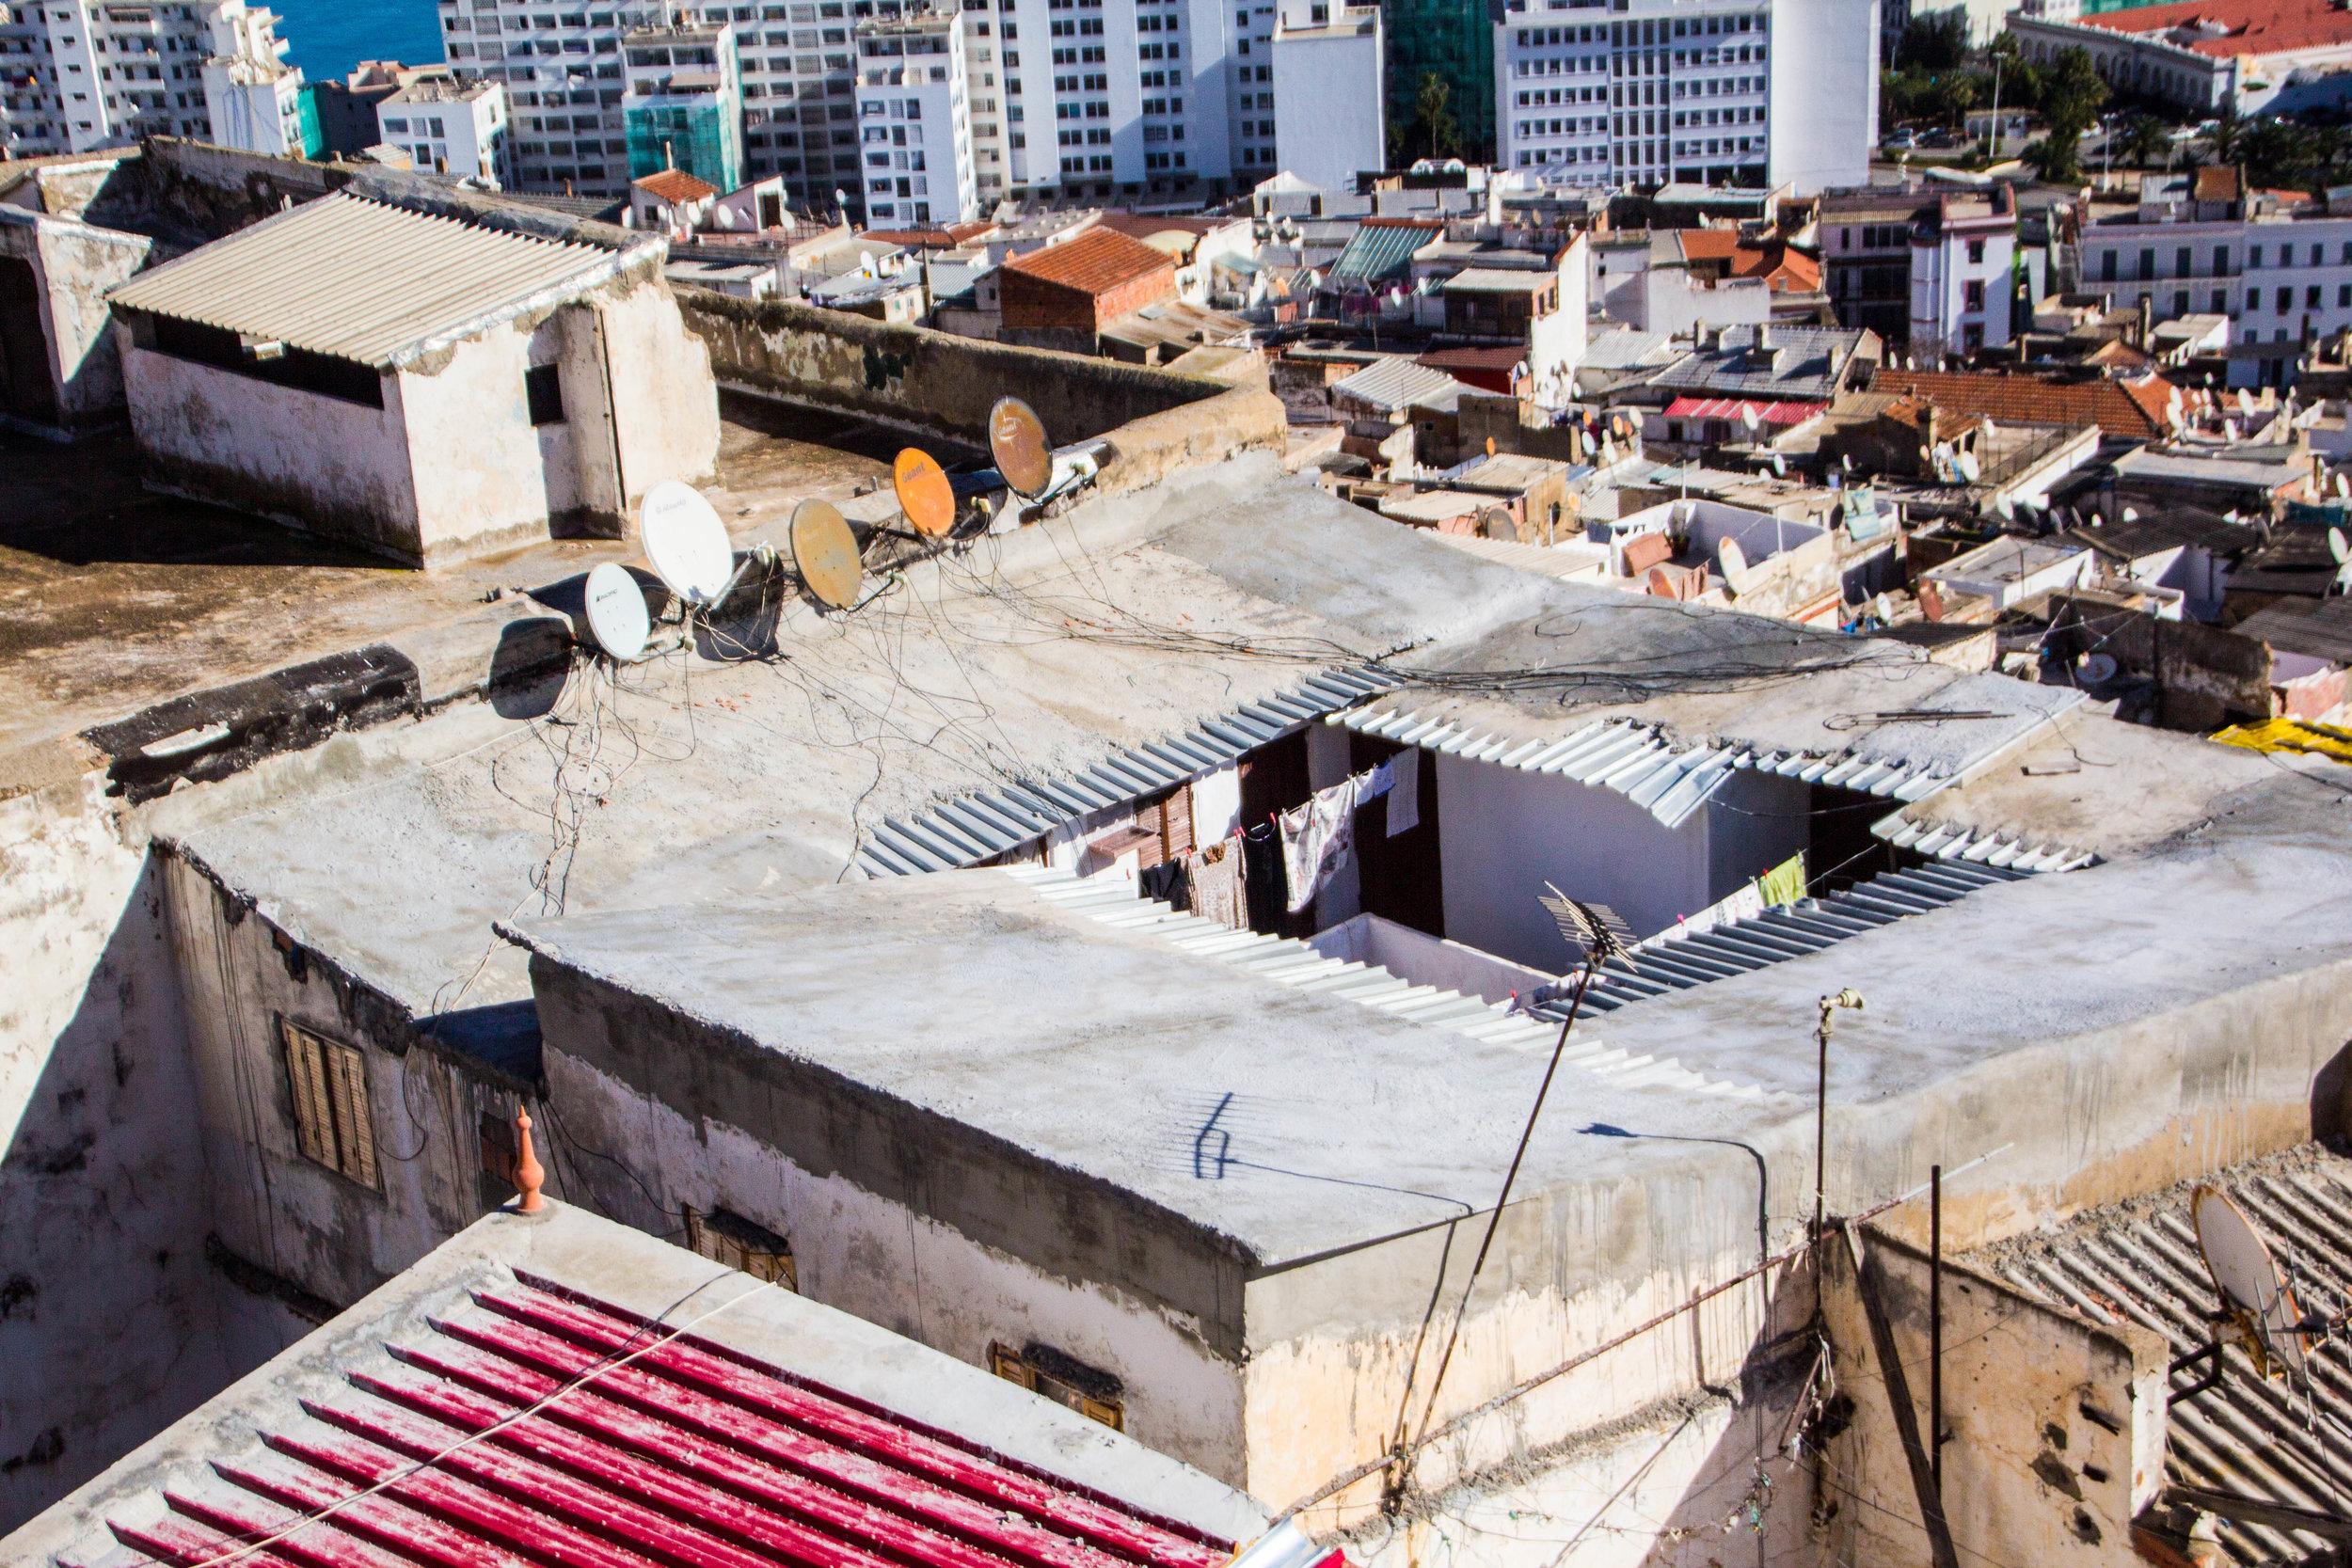 casbah-from-above-algiers-algeria-19.jpg